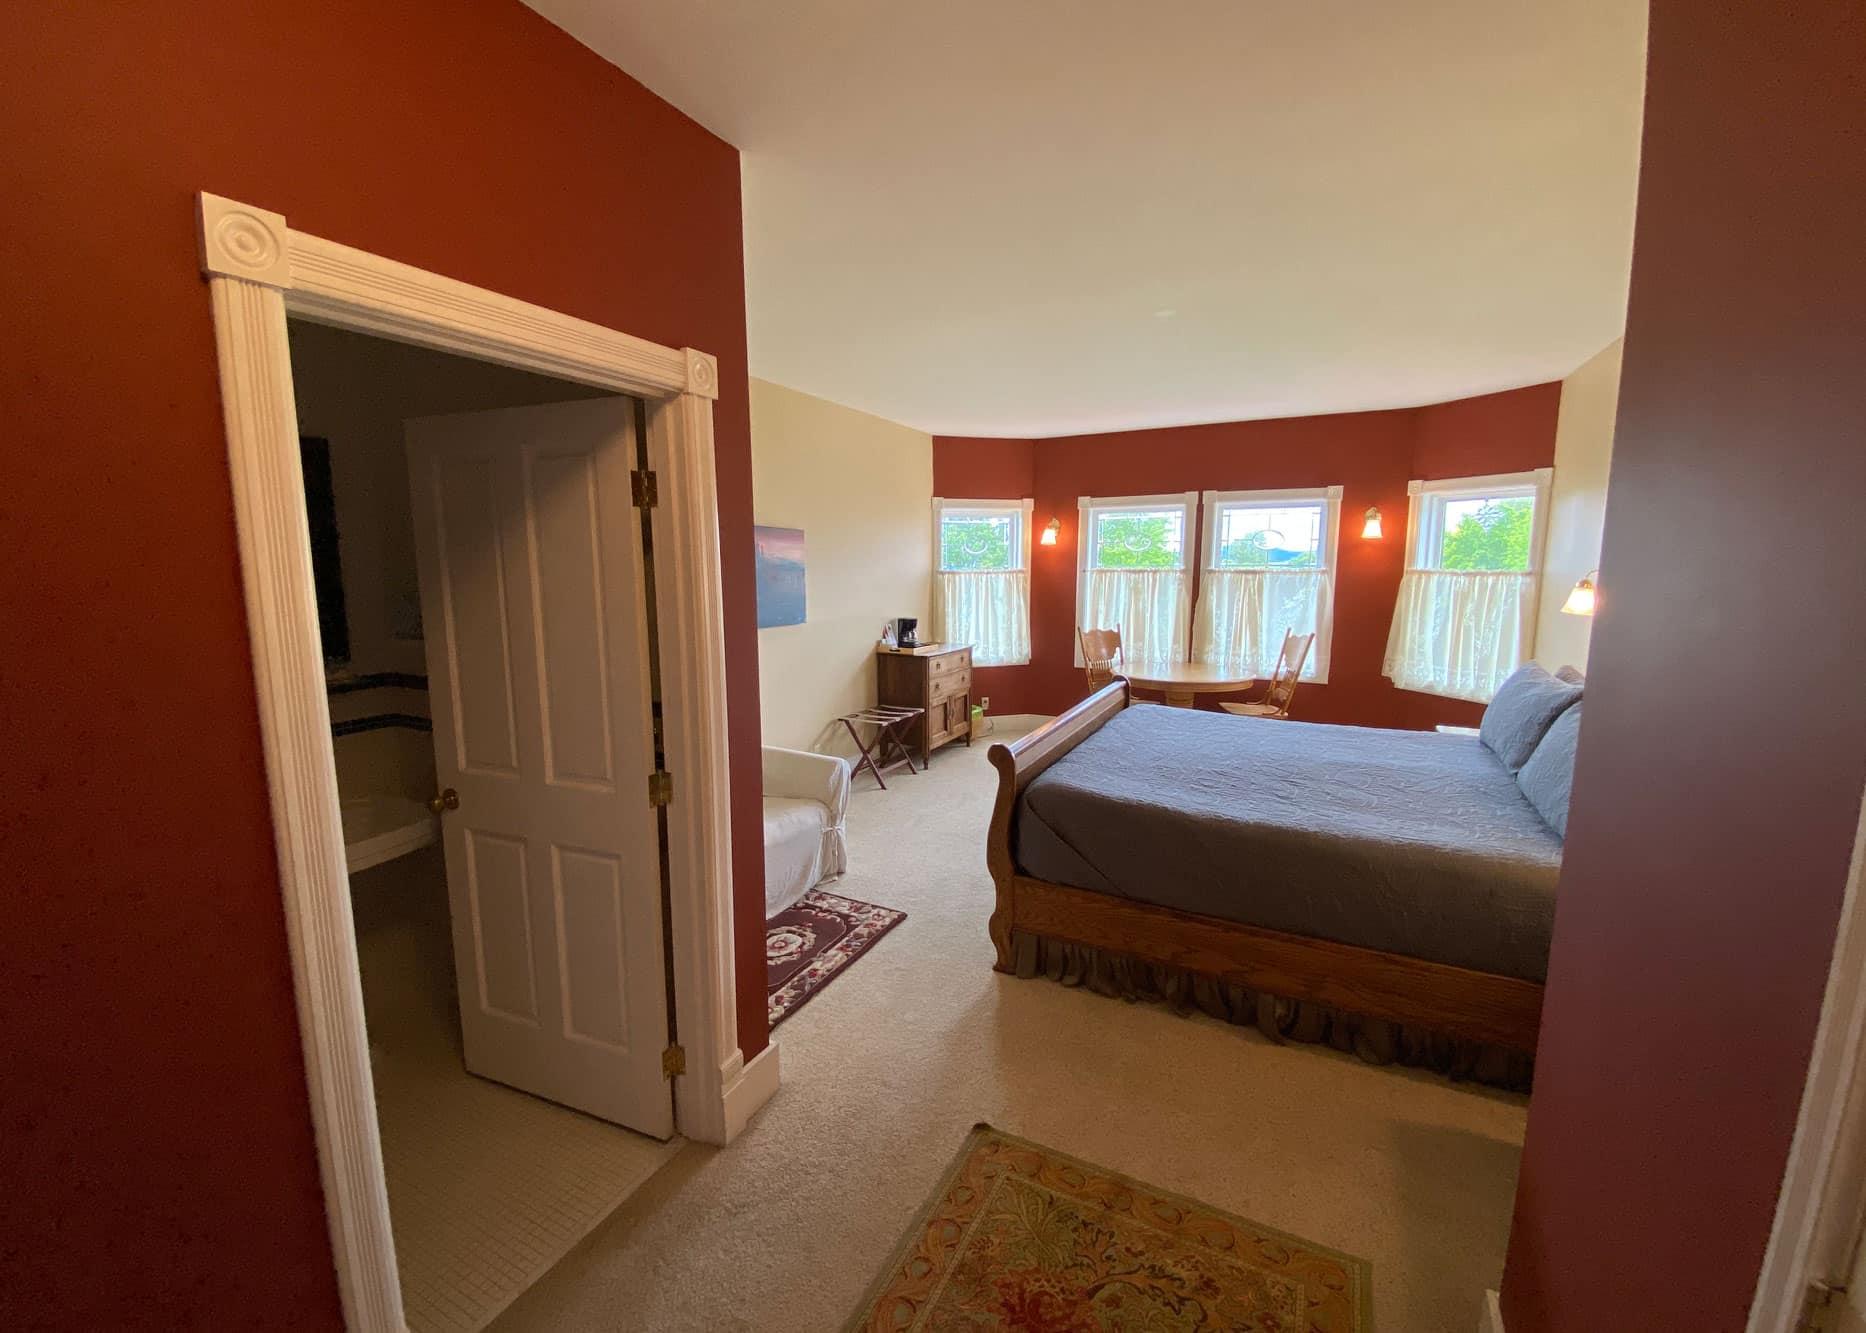 the-edenwild-inn-lopez-island-lodging-2020-room-05-01